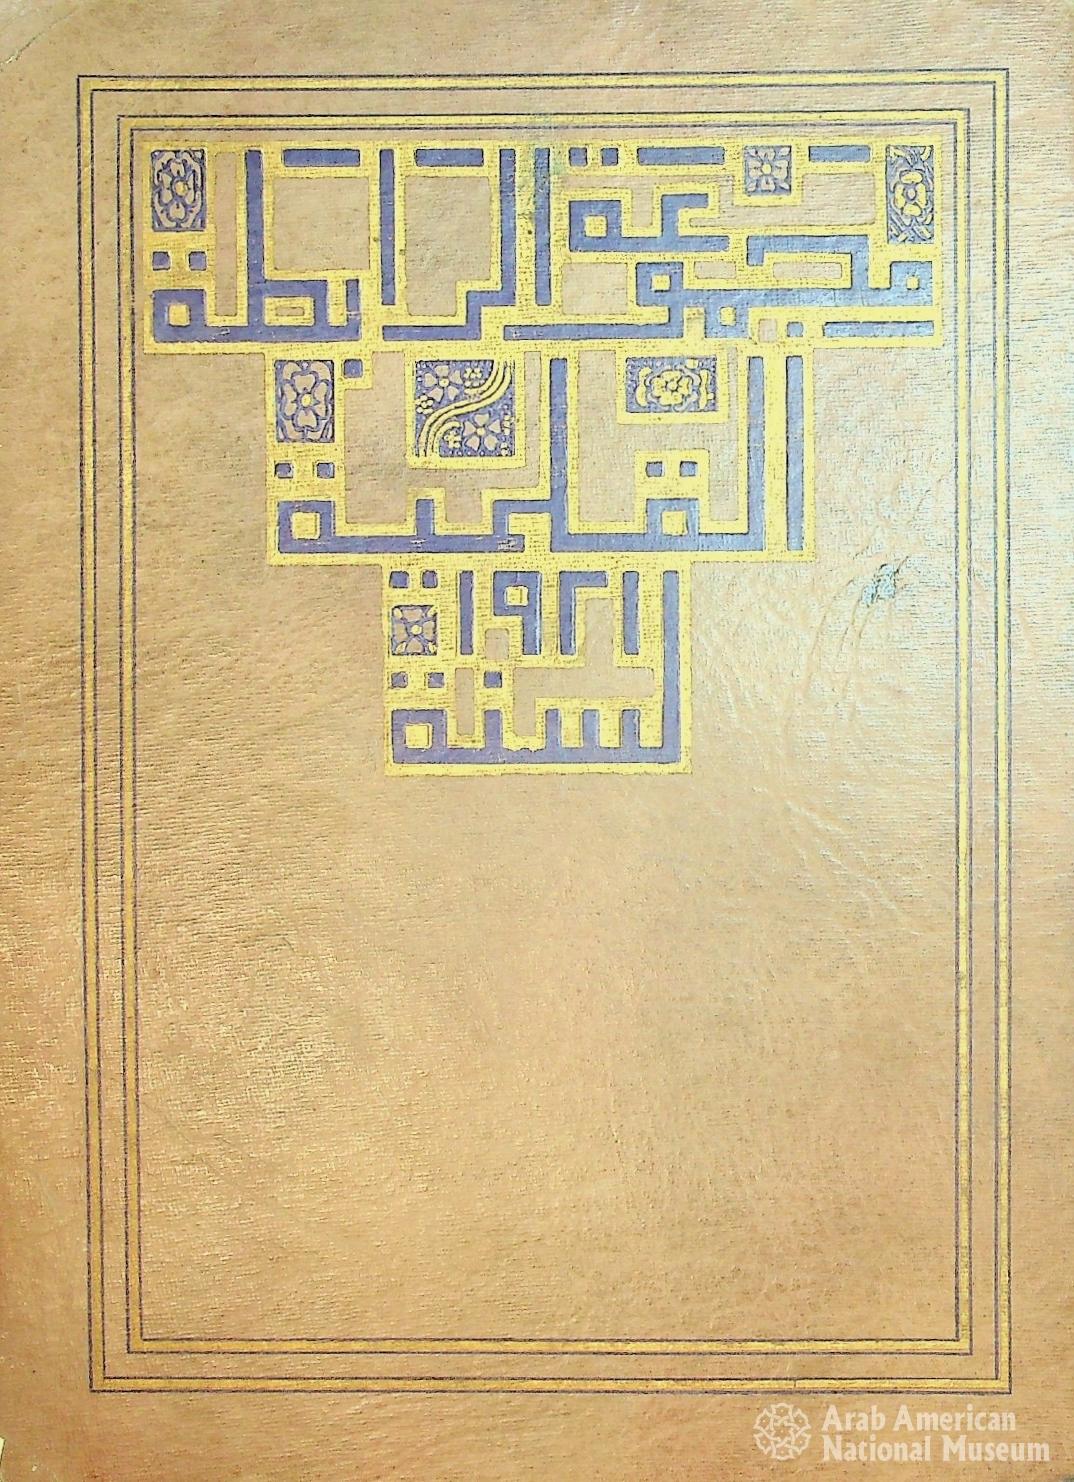 Majmūʻat al-Rābiṭah al-Qalamiyyah li-Sanat 1921 (The Collection of the Pen Bond for the Year 1921), New York, 1921.